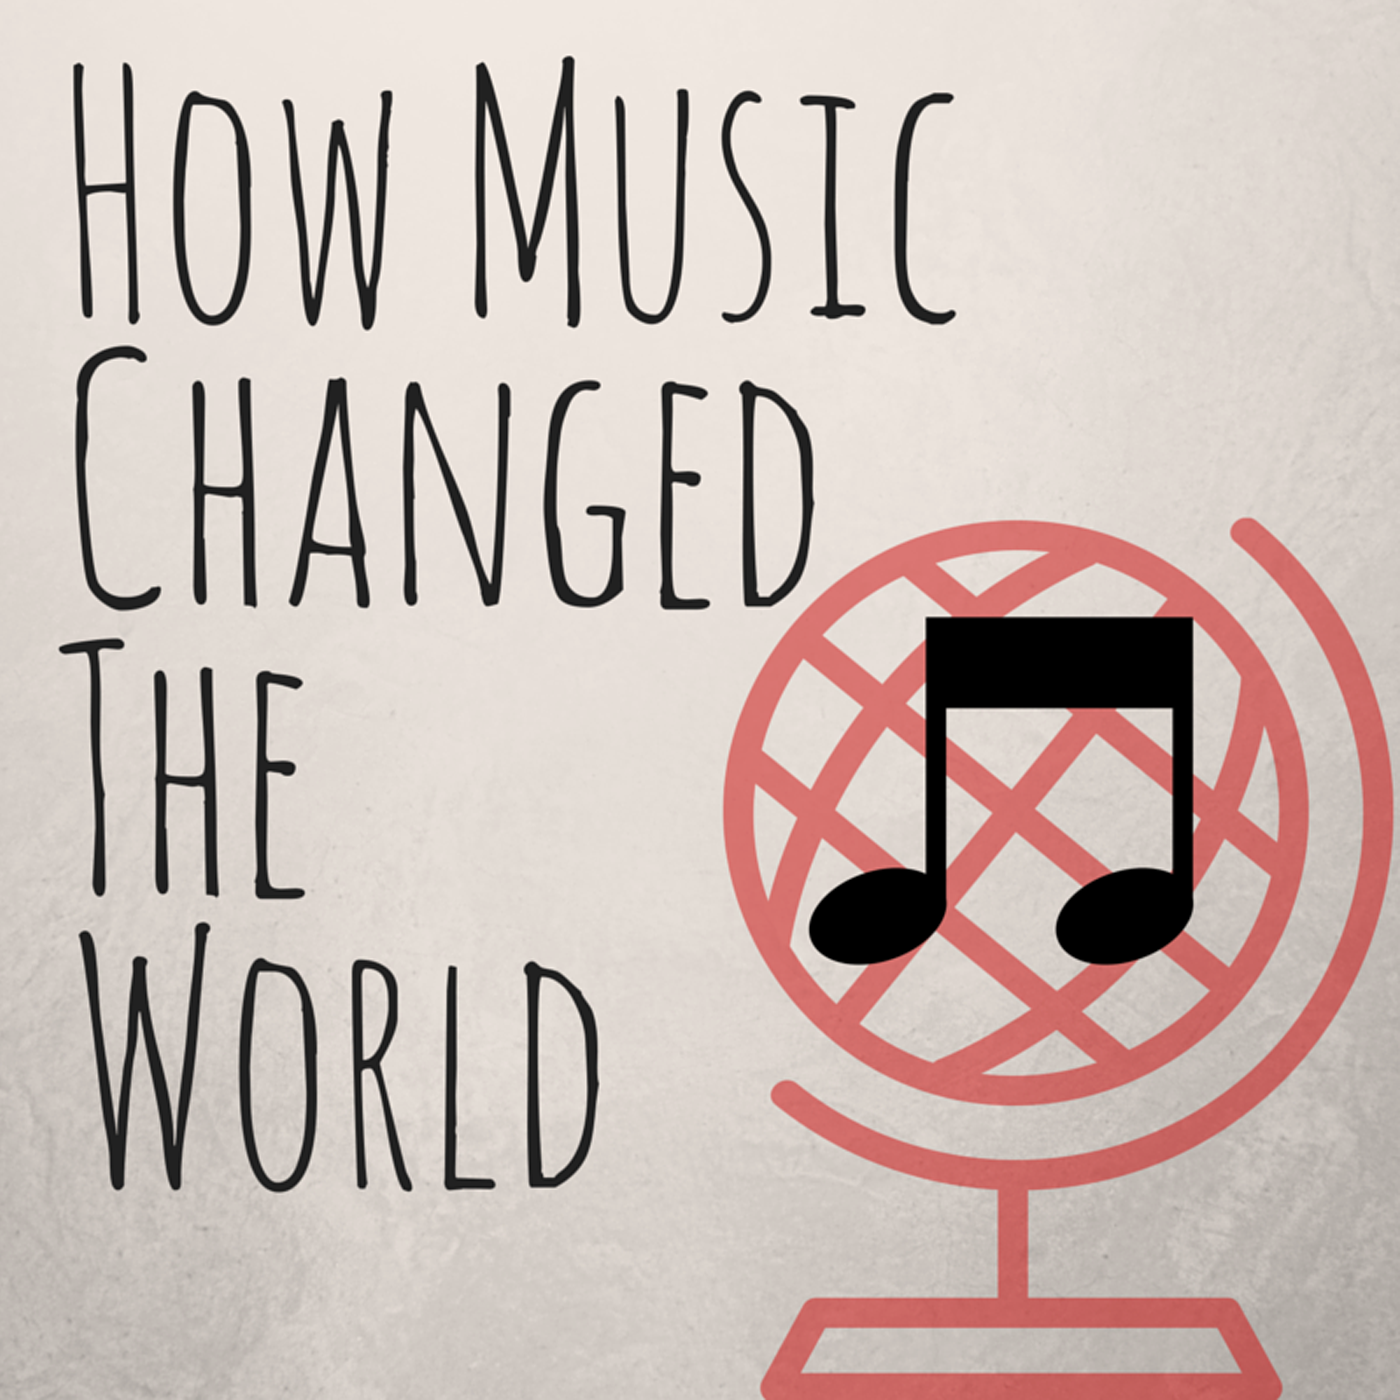 music influence on behavior